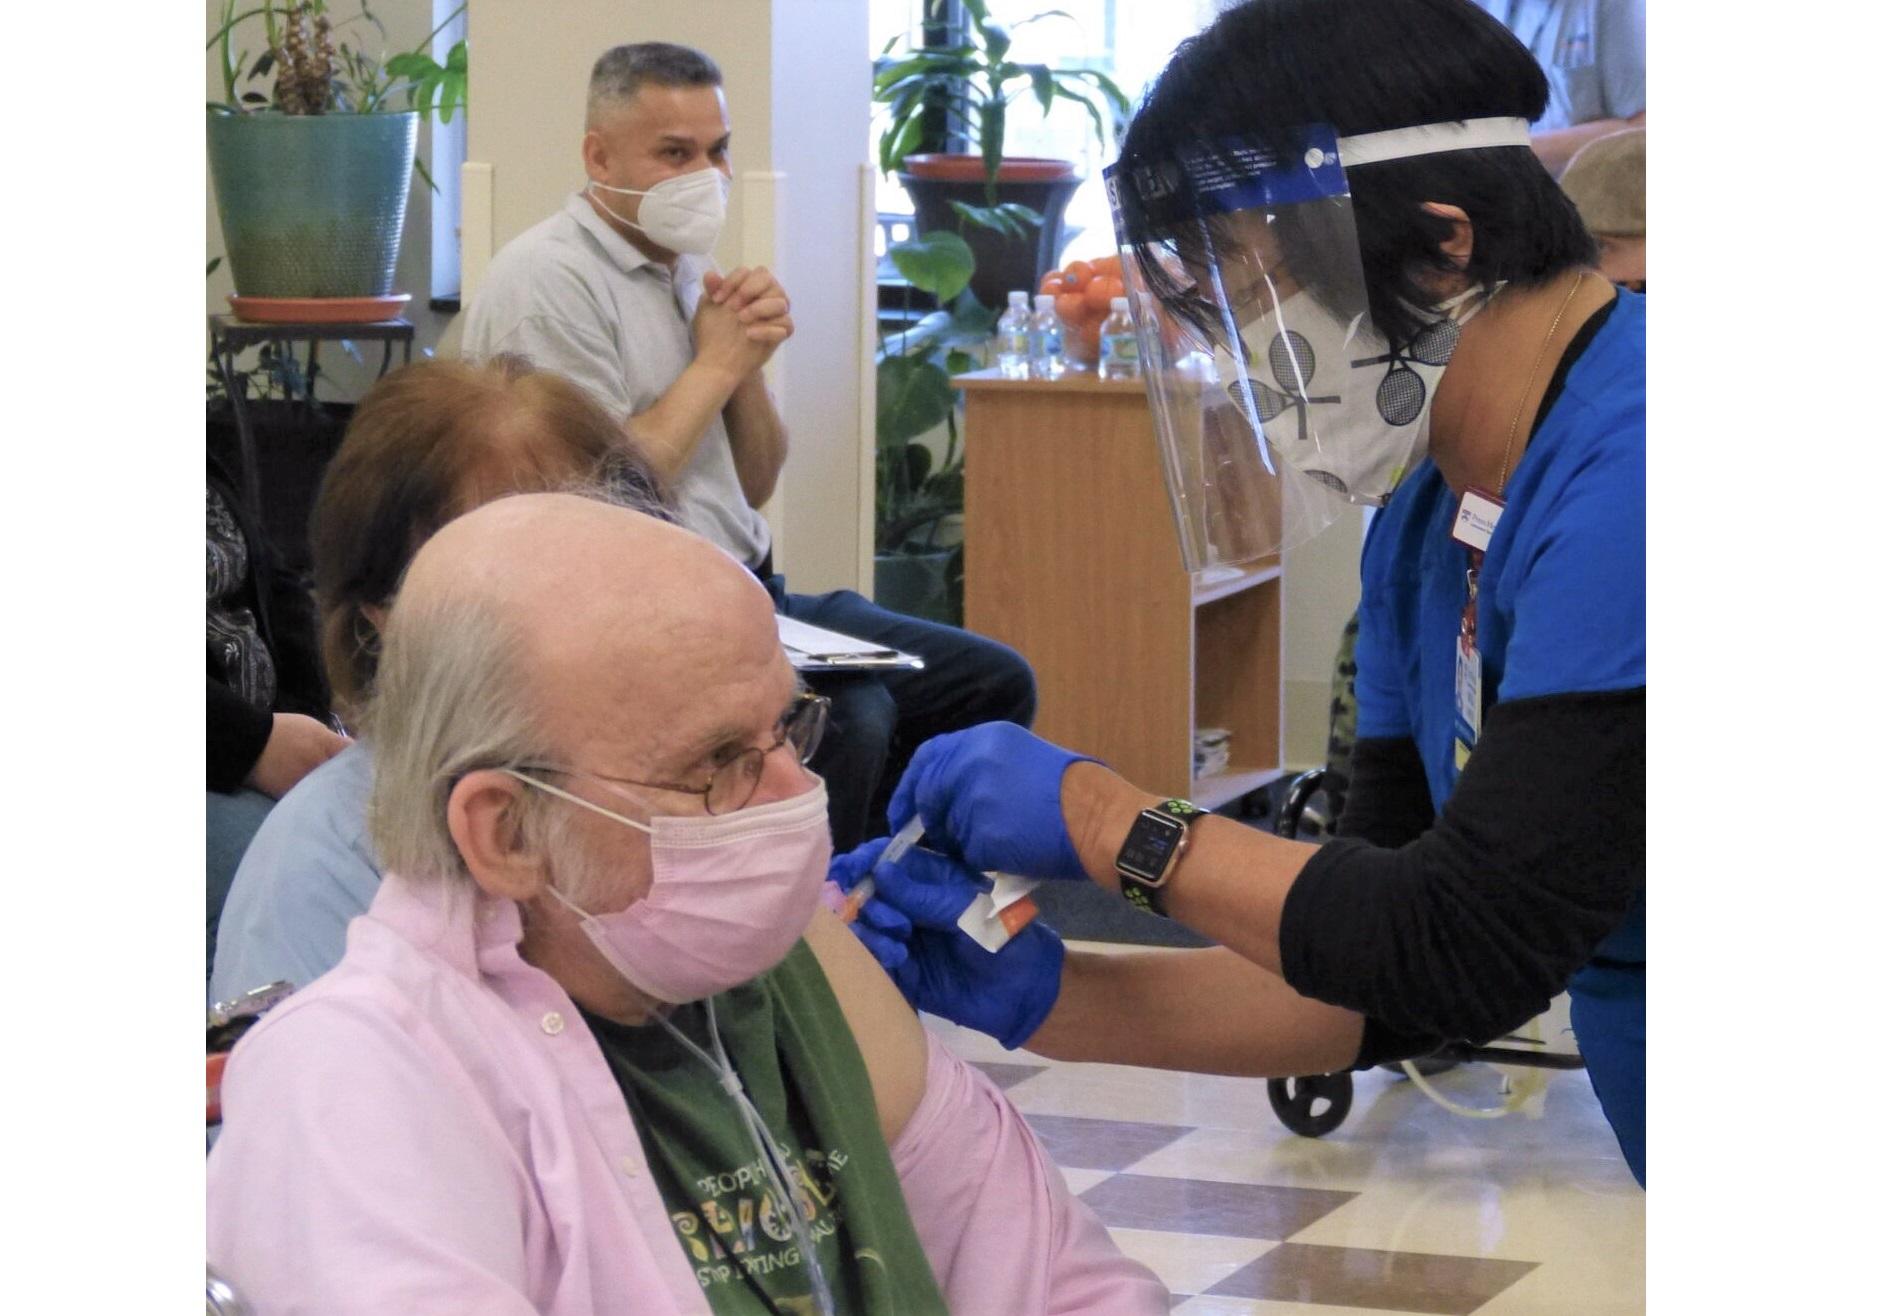 LG Health announces Covid-19 vaccine clinics